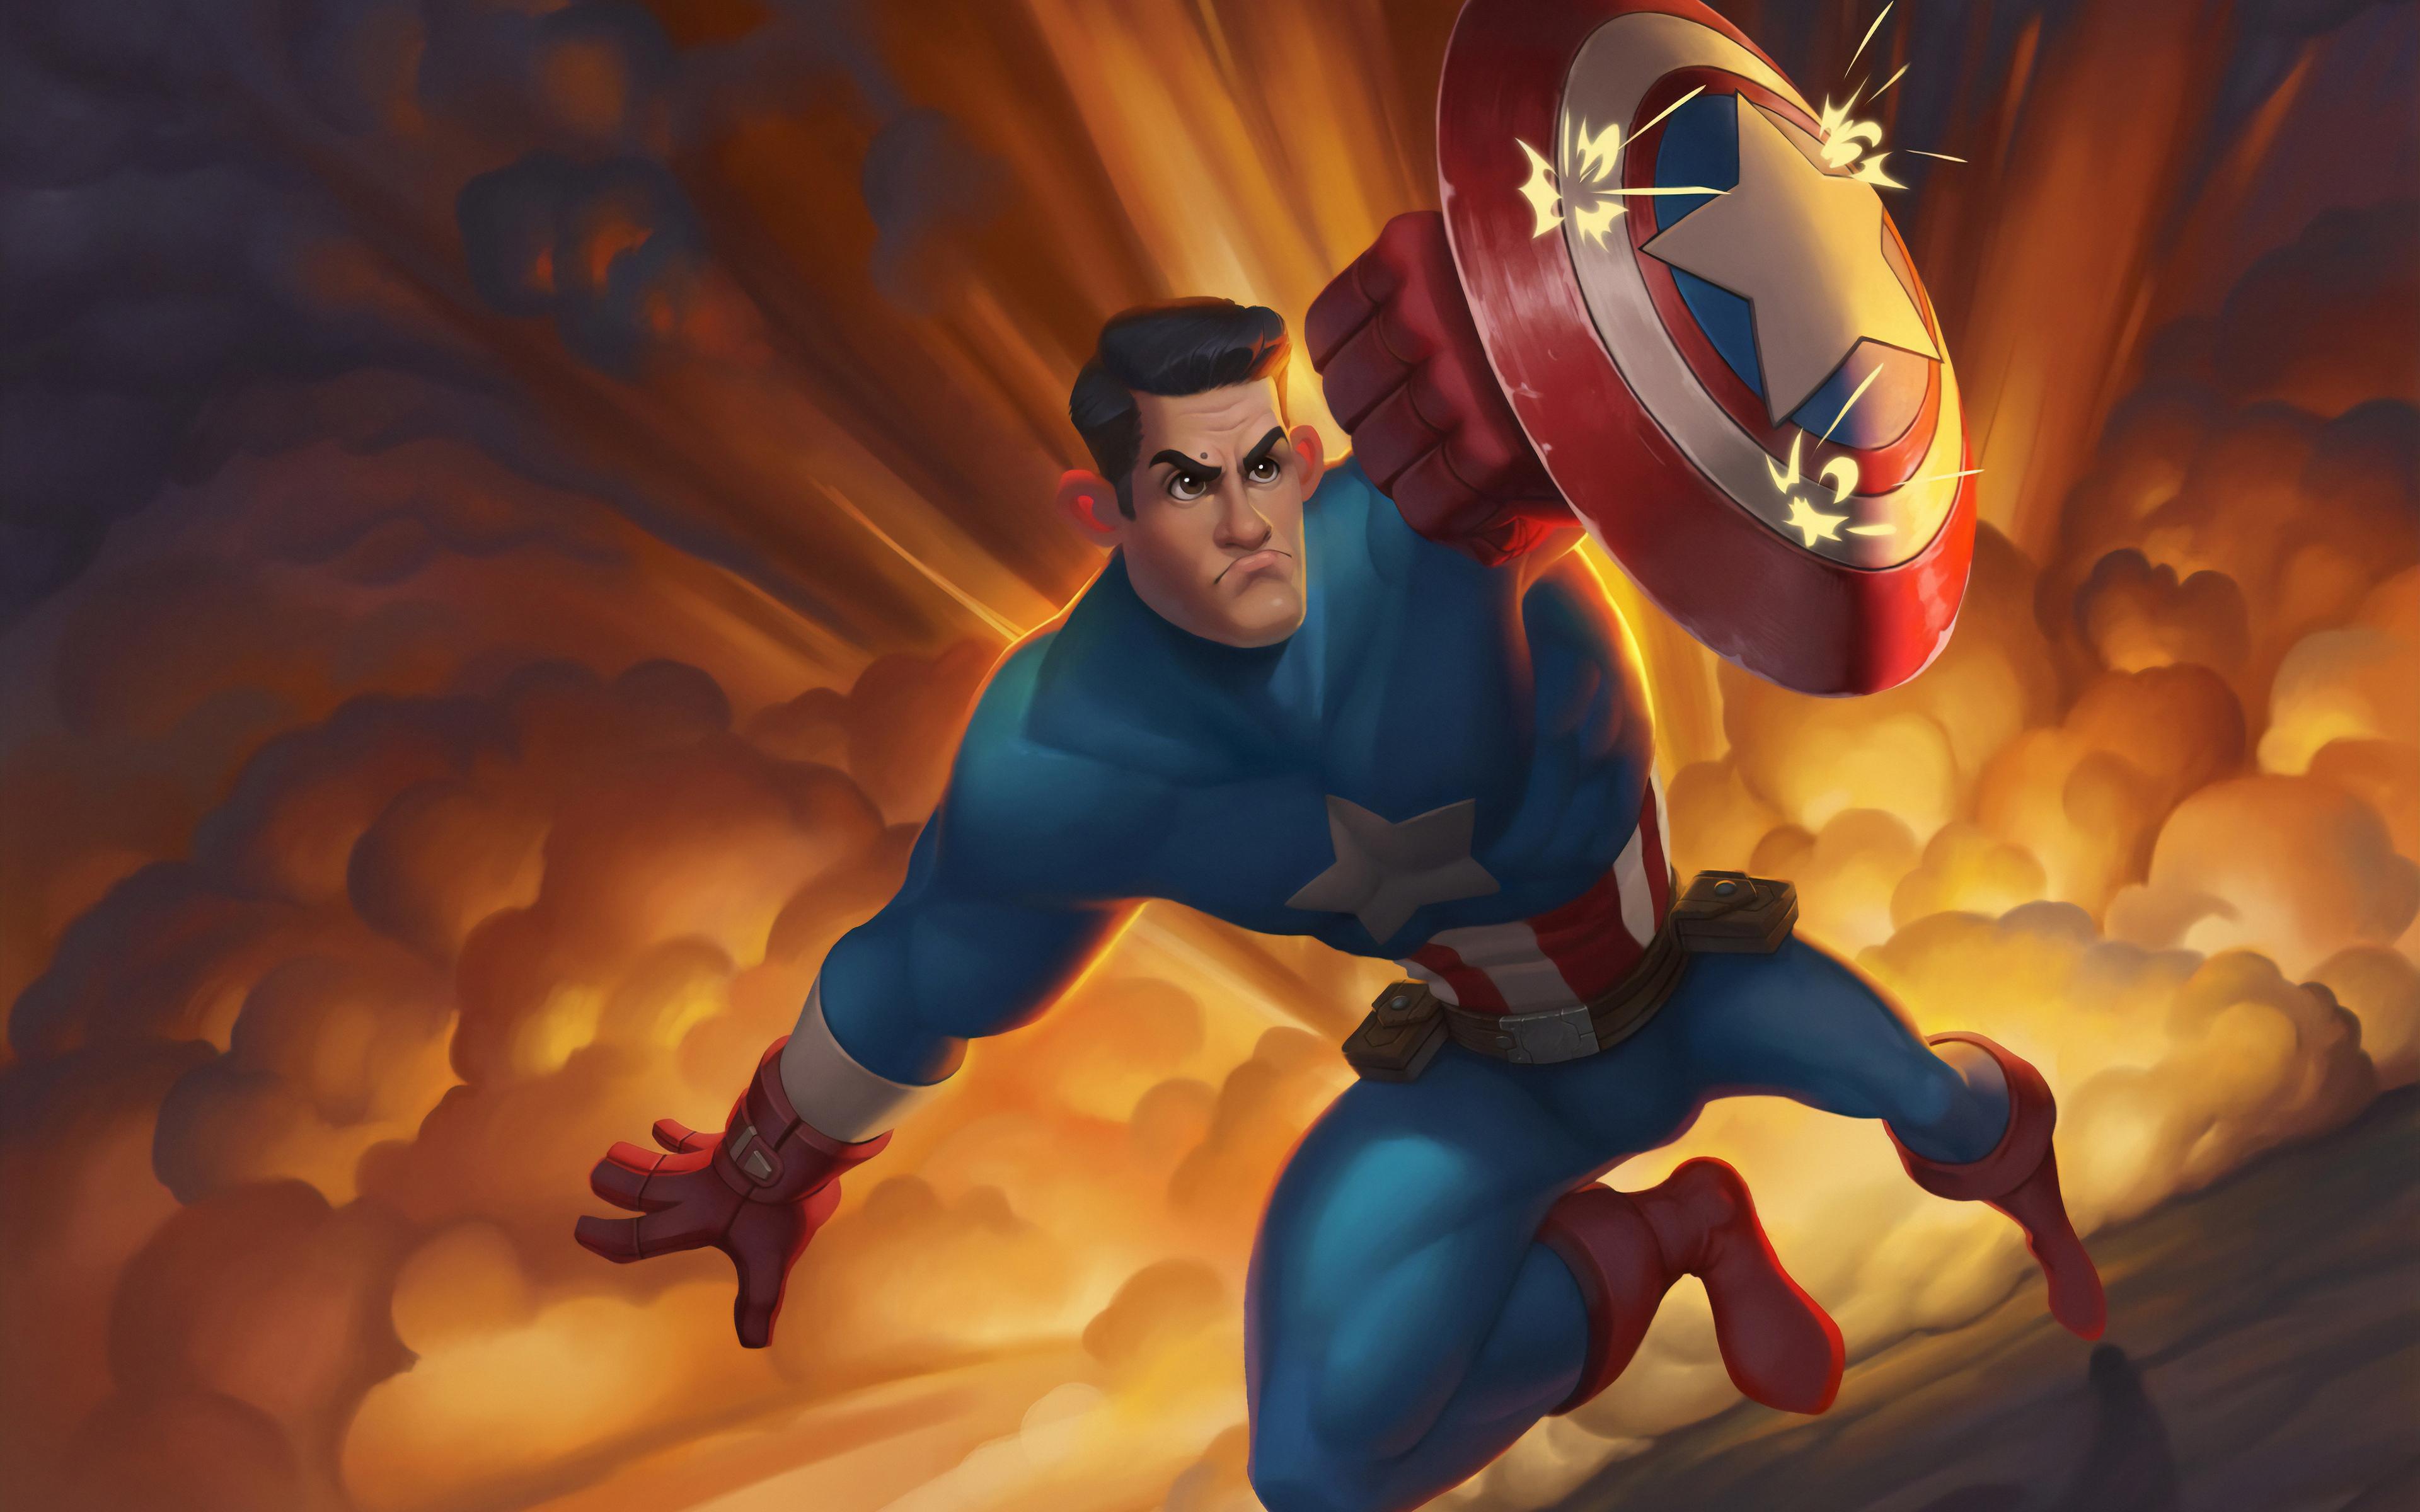 captain-america-shield-art4k-f4.jpg